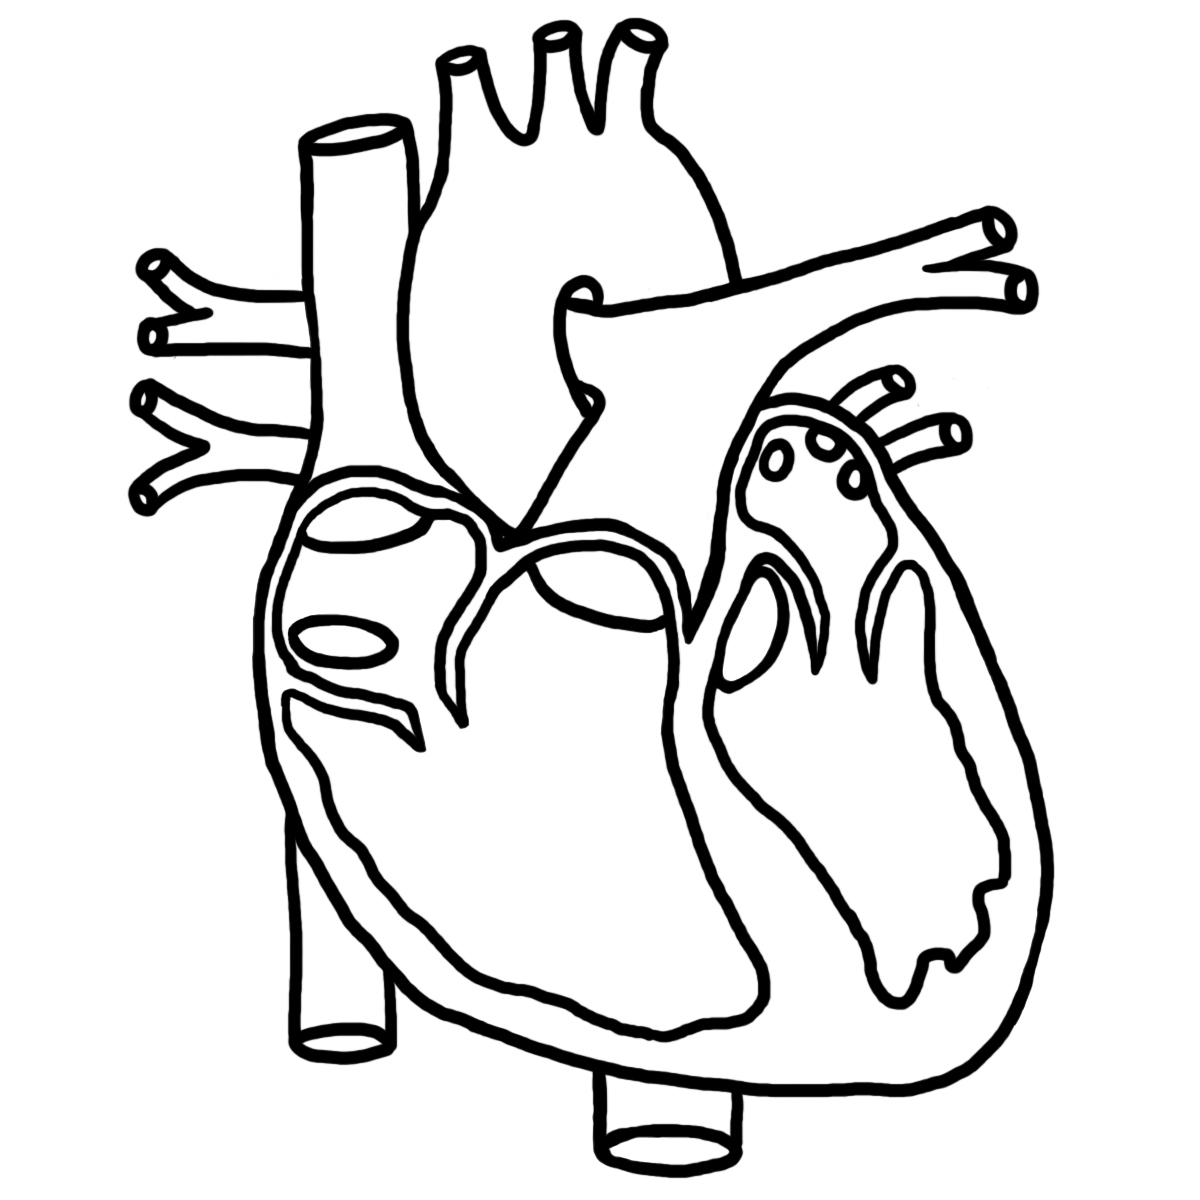 Heart Anatomy Drawing At Getdrawings